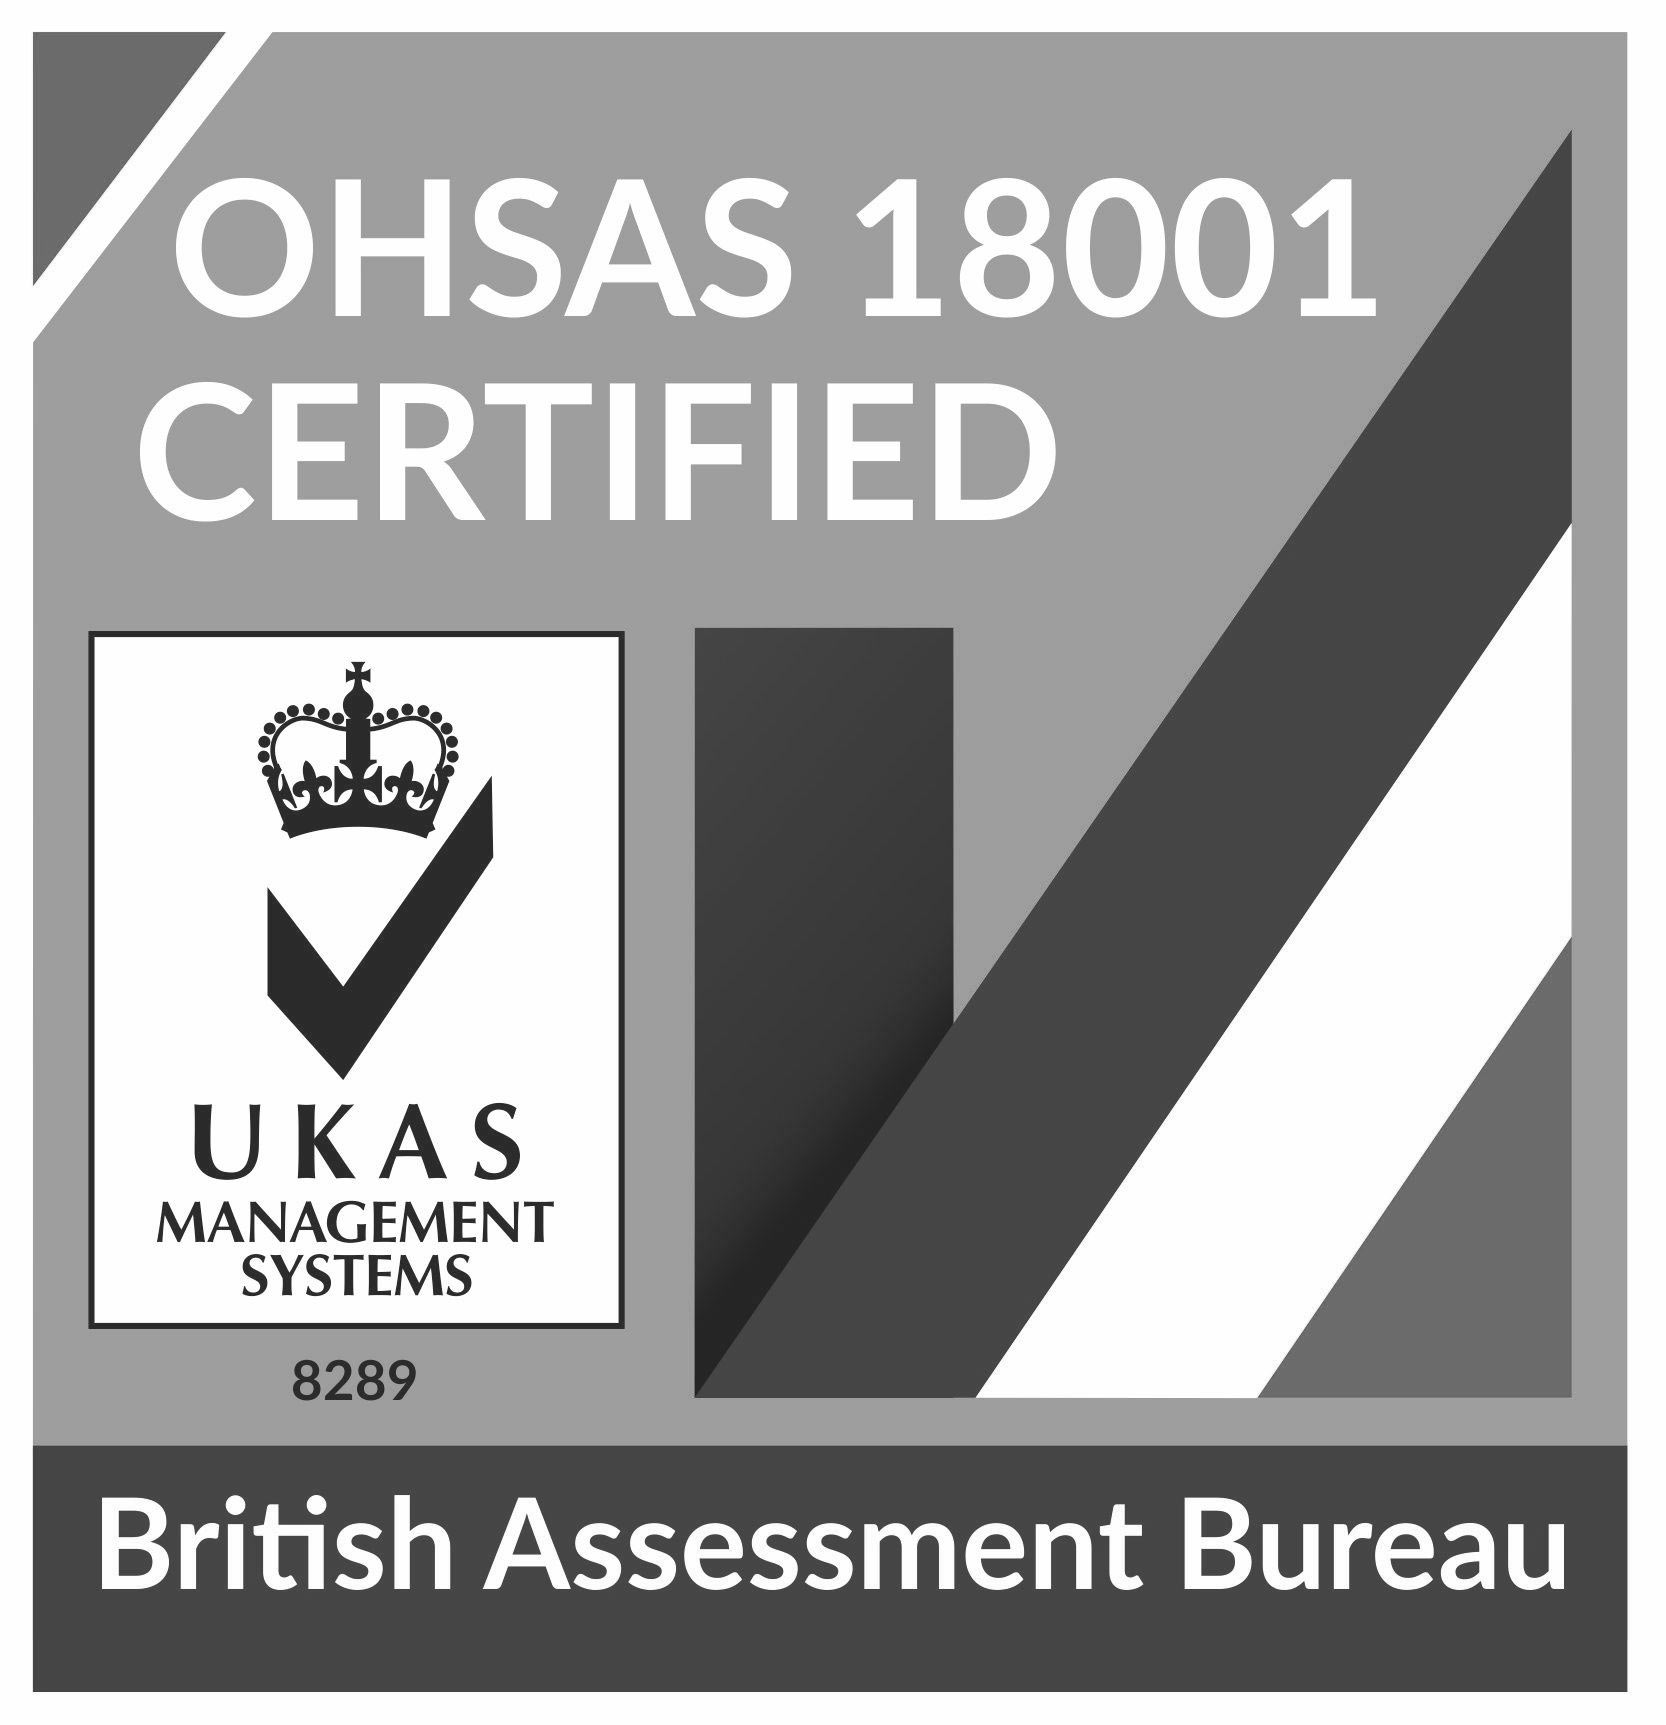 UKAS-OHSAS-18001(b&w)